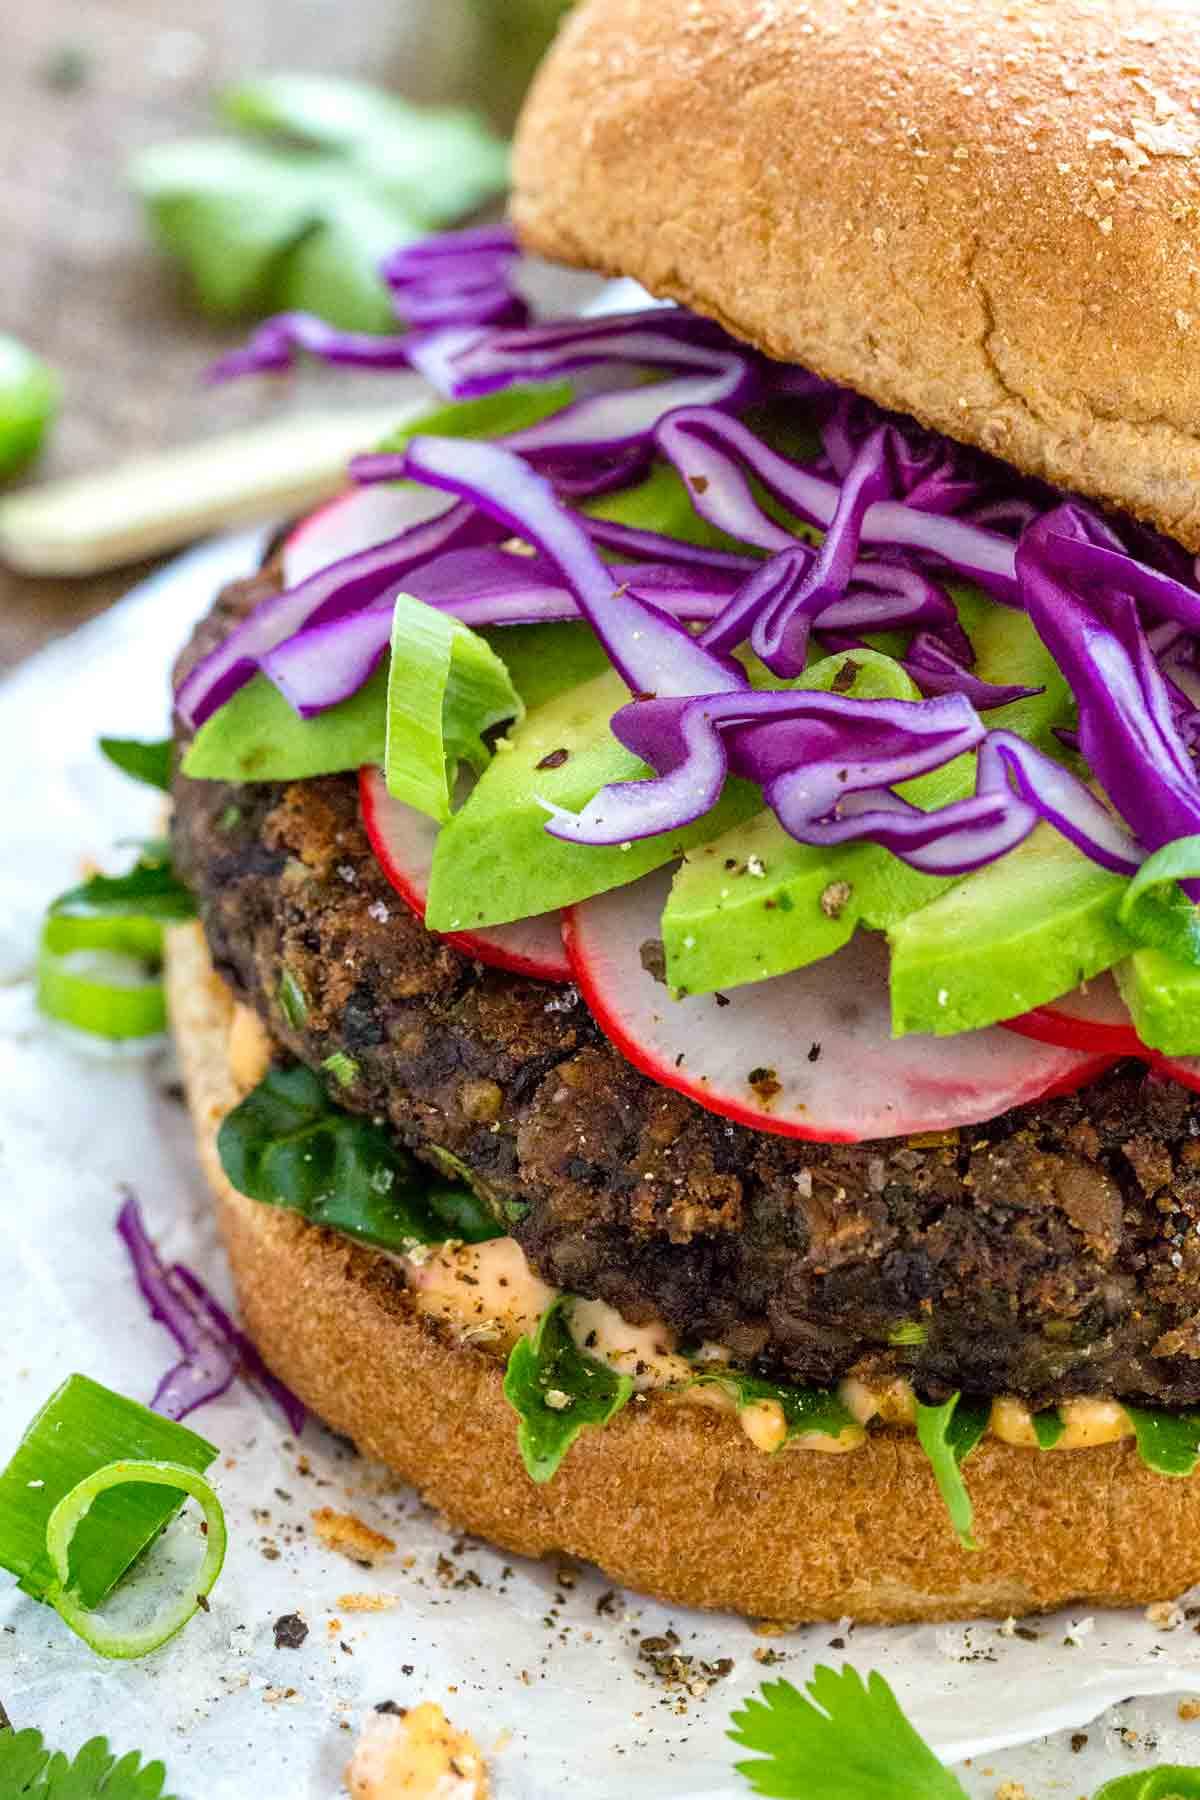 close up photo of a black bean burger with avocado slices and garnish